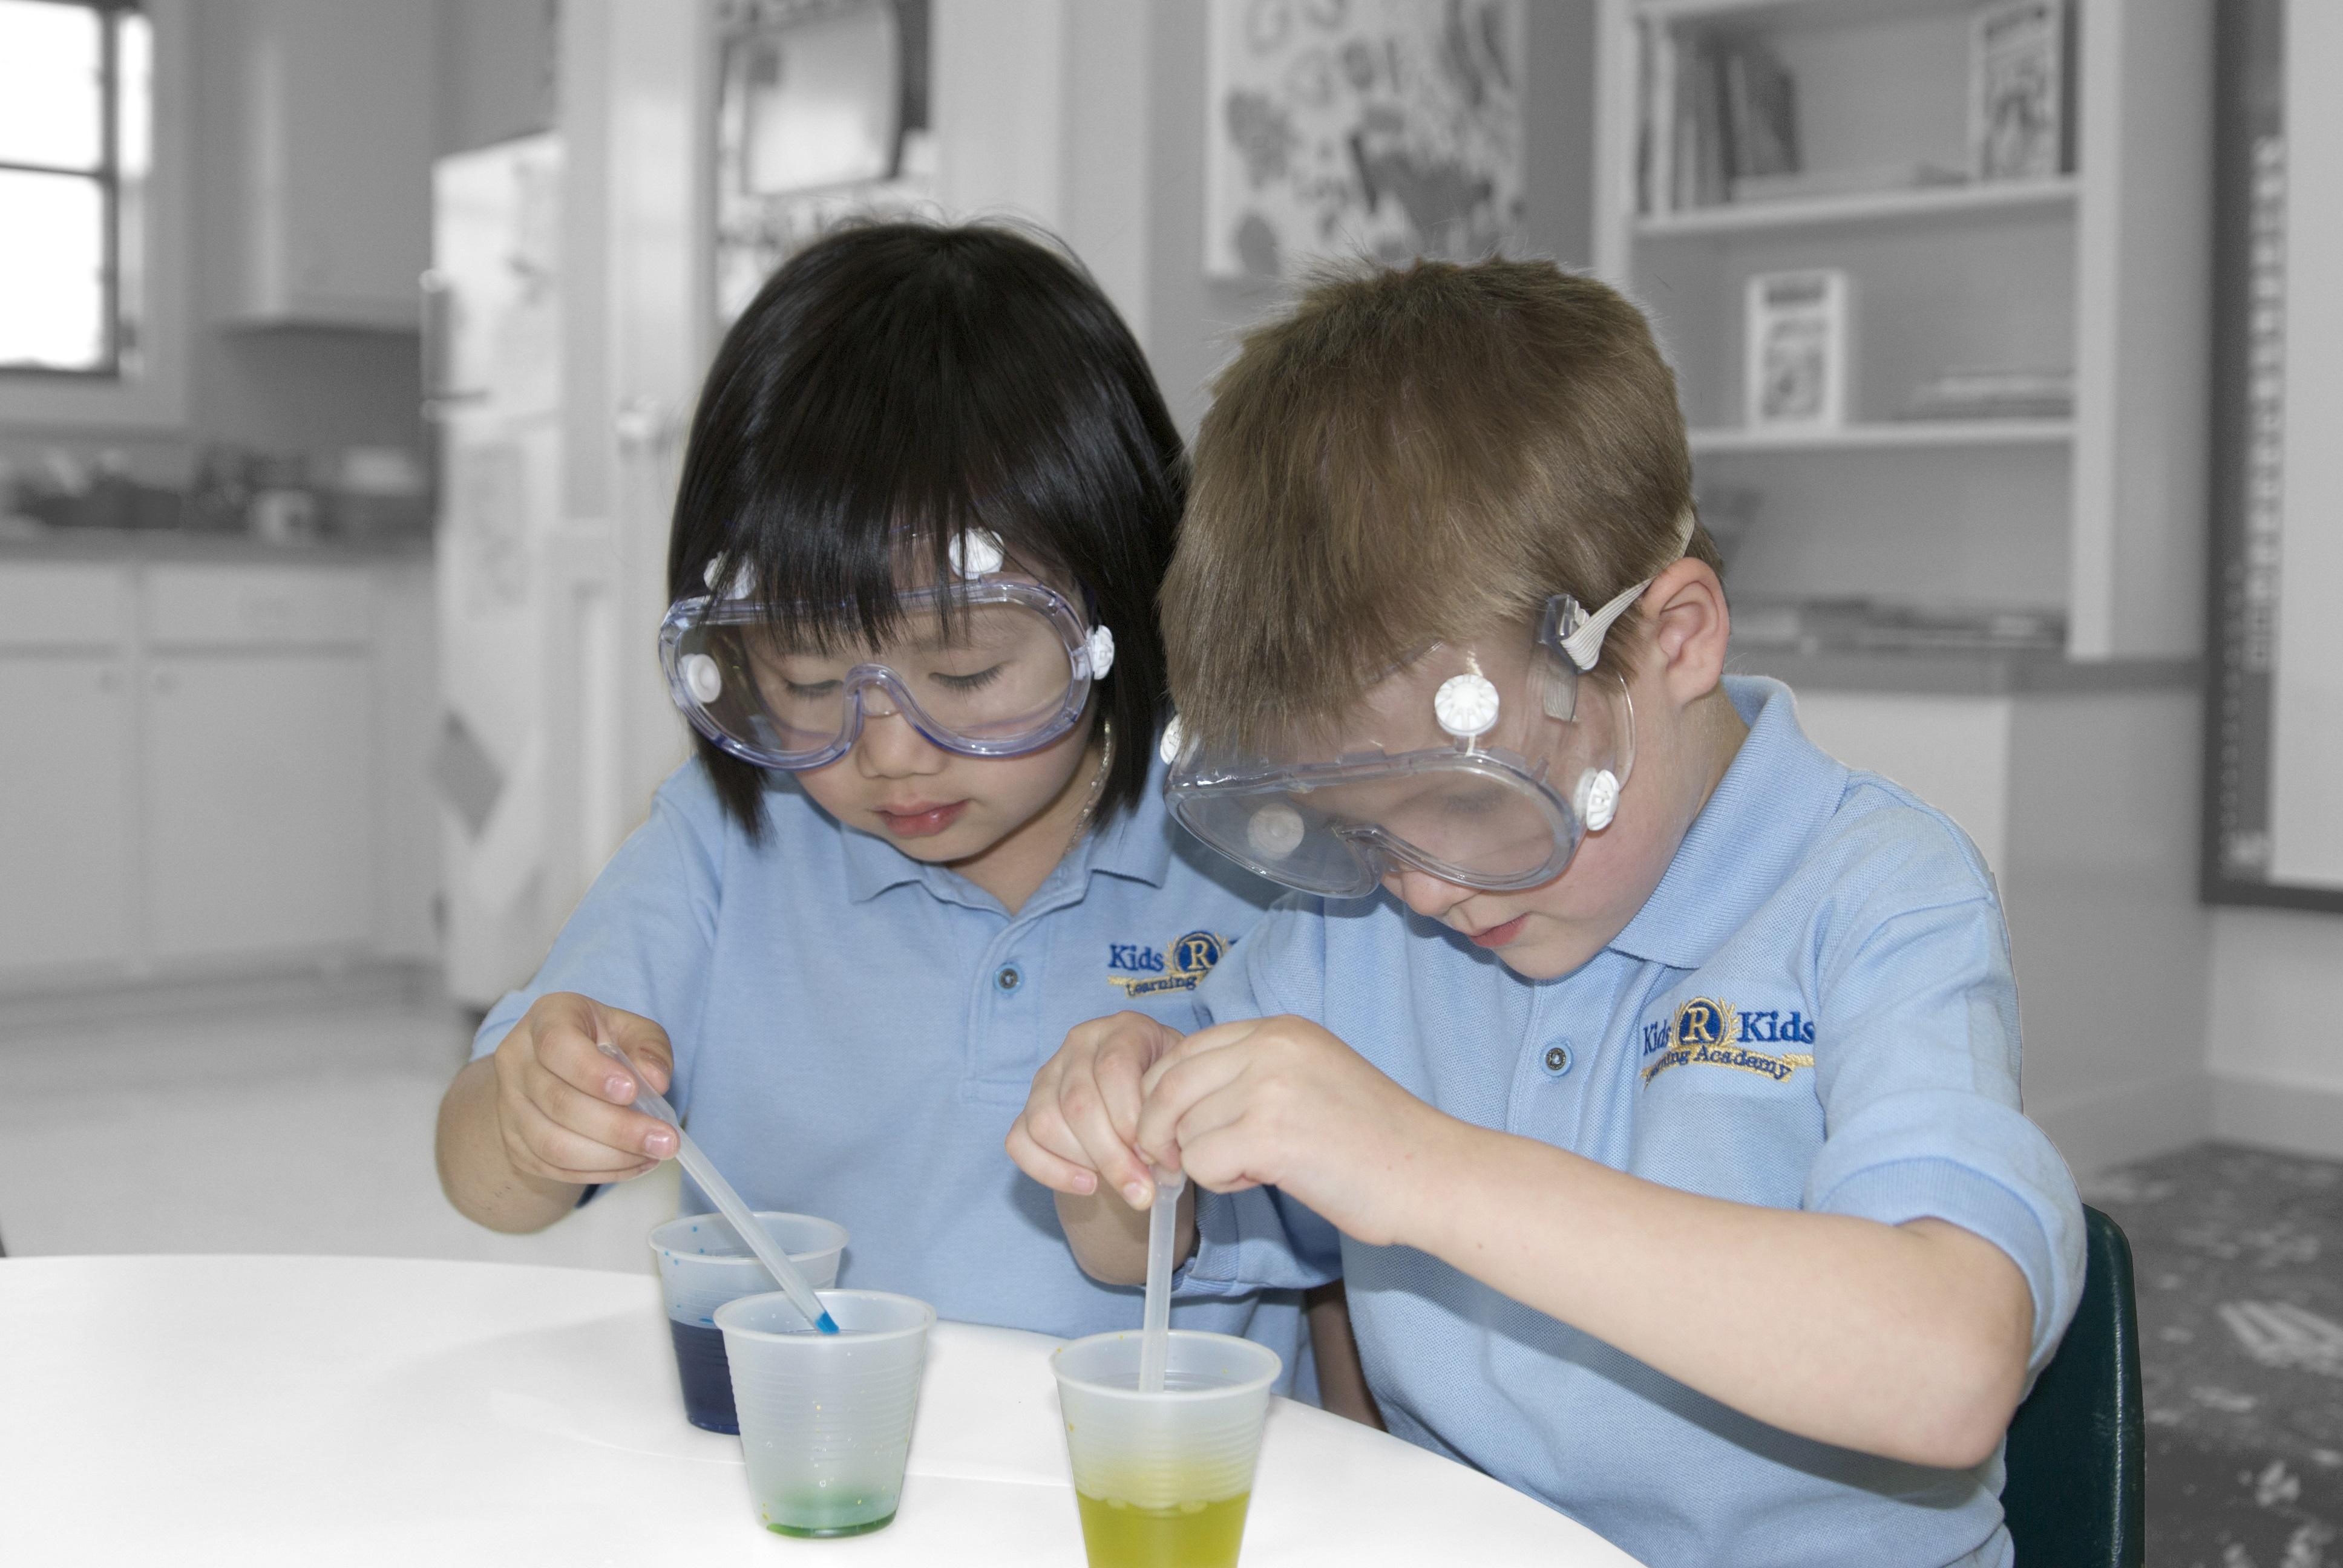 Kids R Kids Learning Academy 3900 Canton Rd Marietta